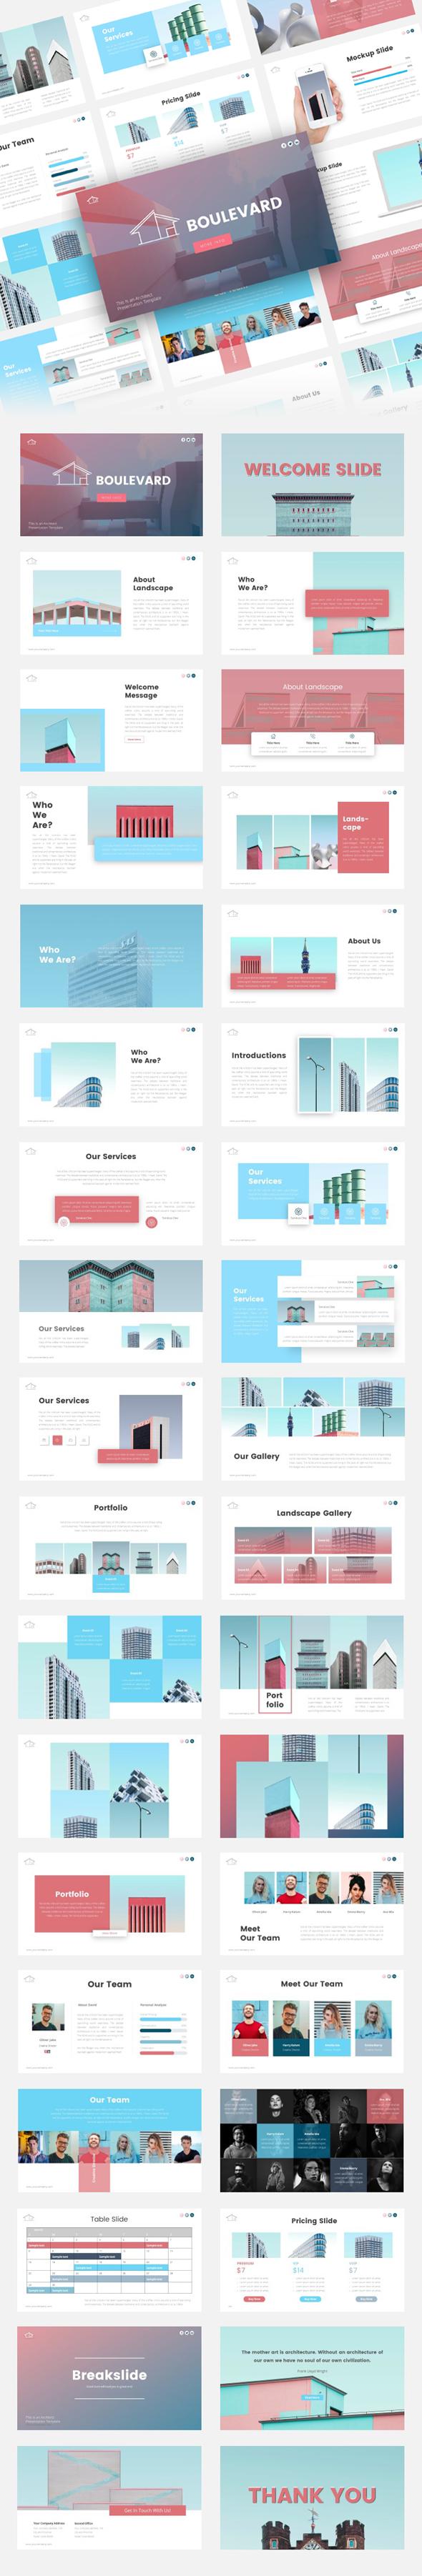 Boulevard Architecture Presentation